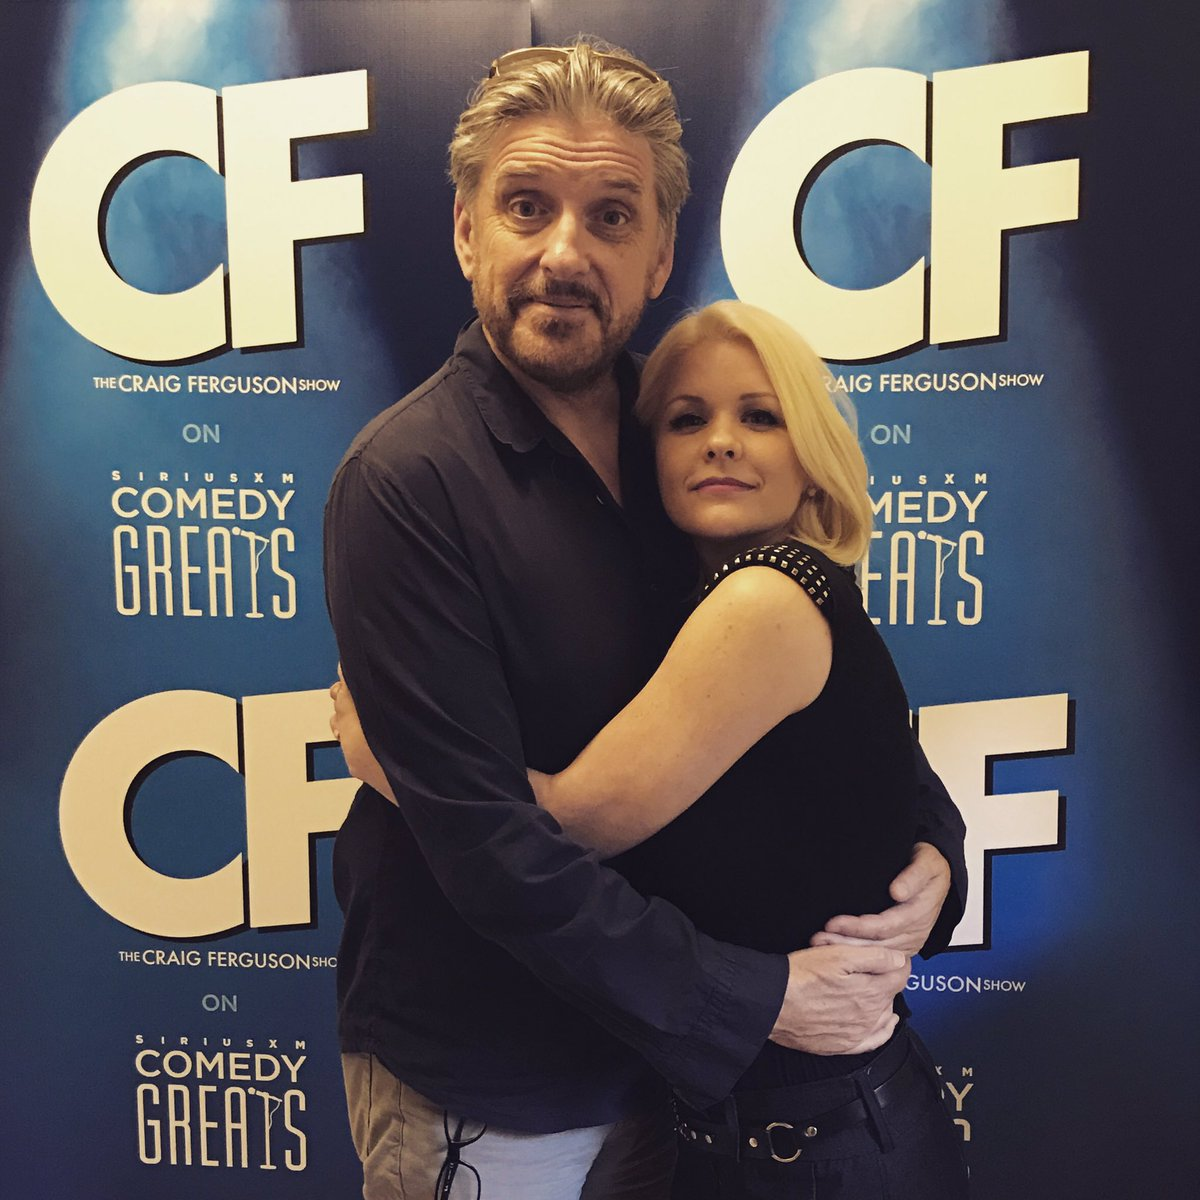 "Craig Ferguson Show on Twitter: ""It was fun to cuss with Carrie Keagan! @CarrieKeagan @SIRIUSXM https://t.co/IZ4GKNdBTv"""